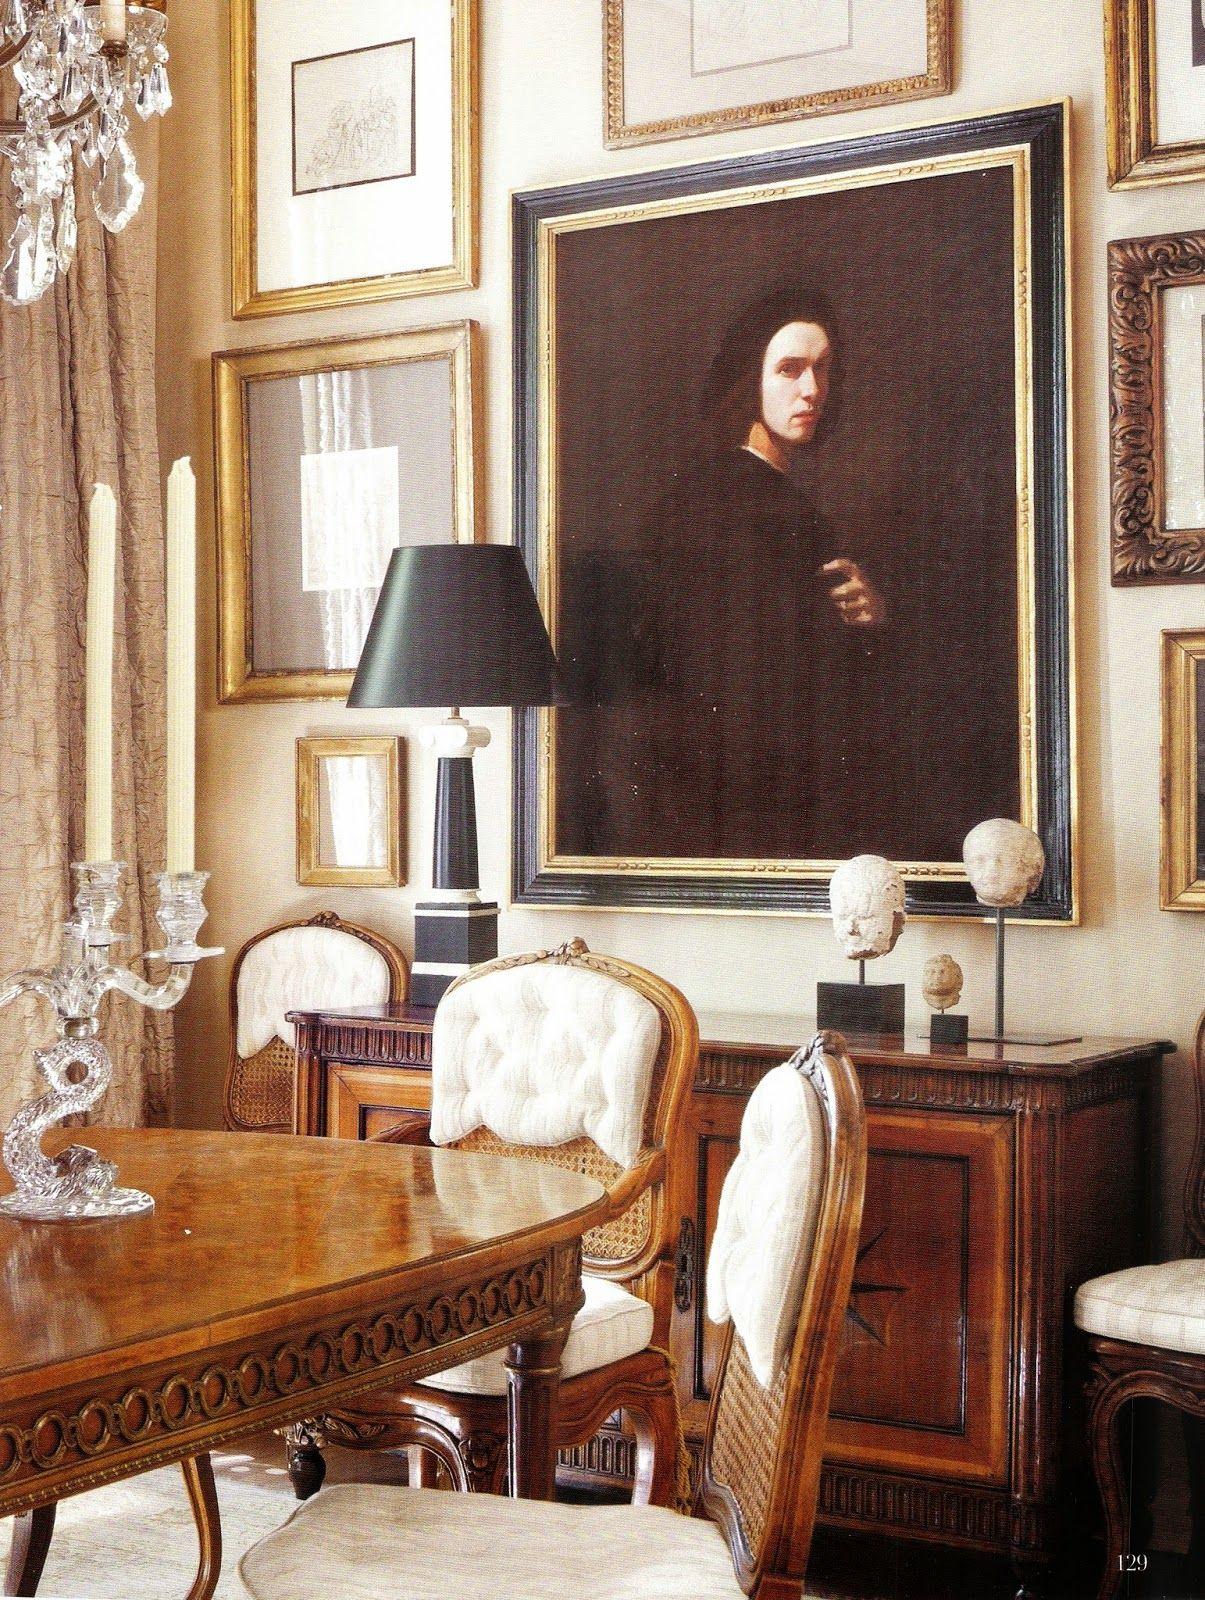 LOUIS XVI Dining Room Table. LK. A Flippen Life: Gerrie Bremermann